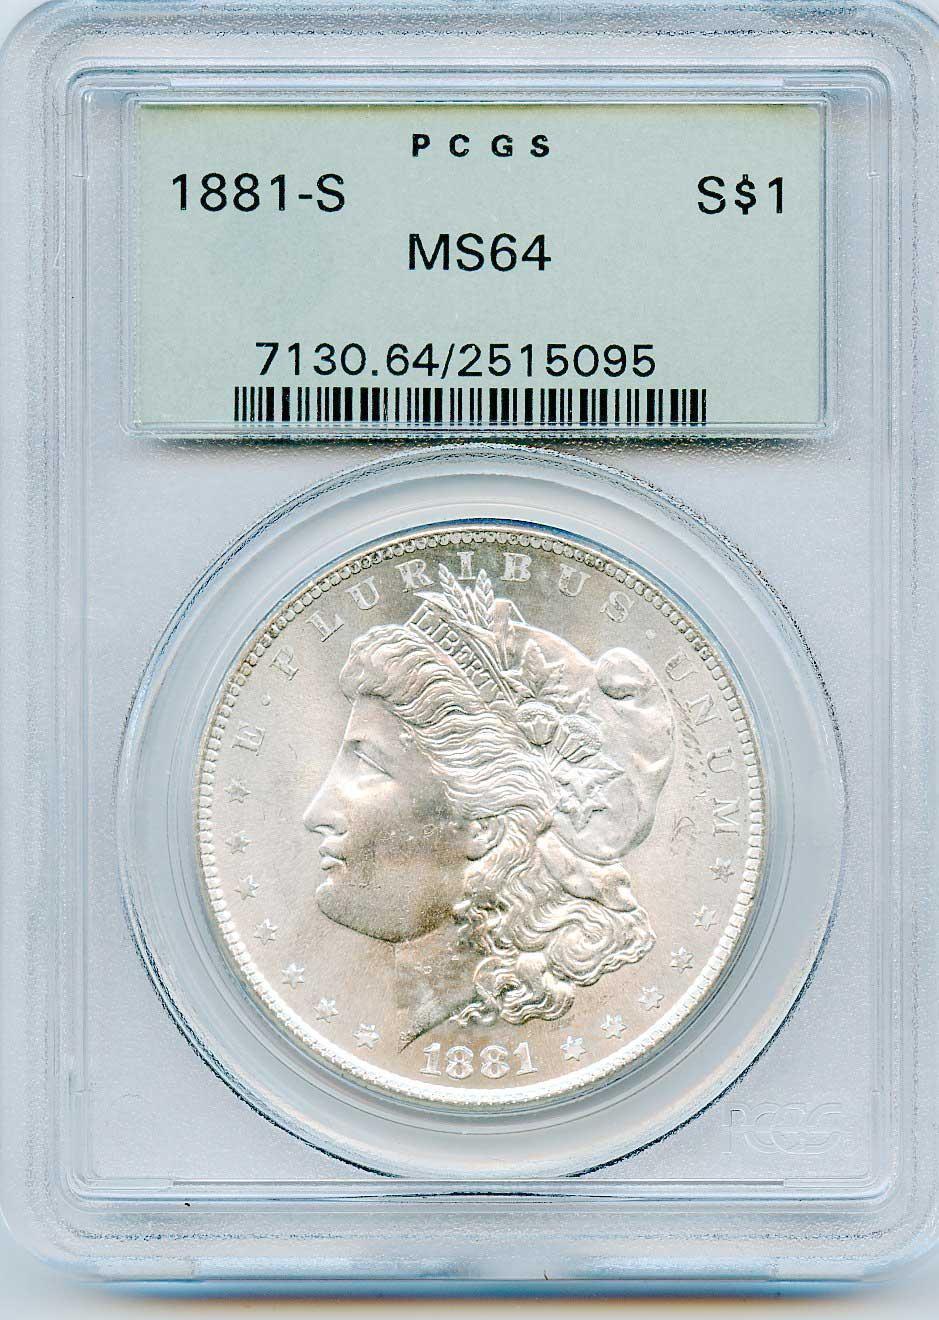 1881-S Morgan Silver Dollar in PCGS MS64